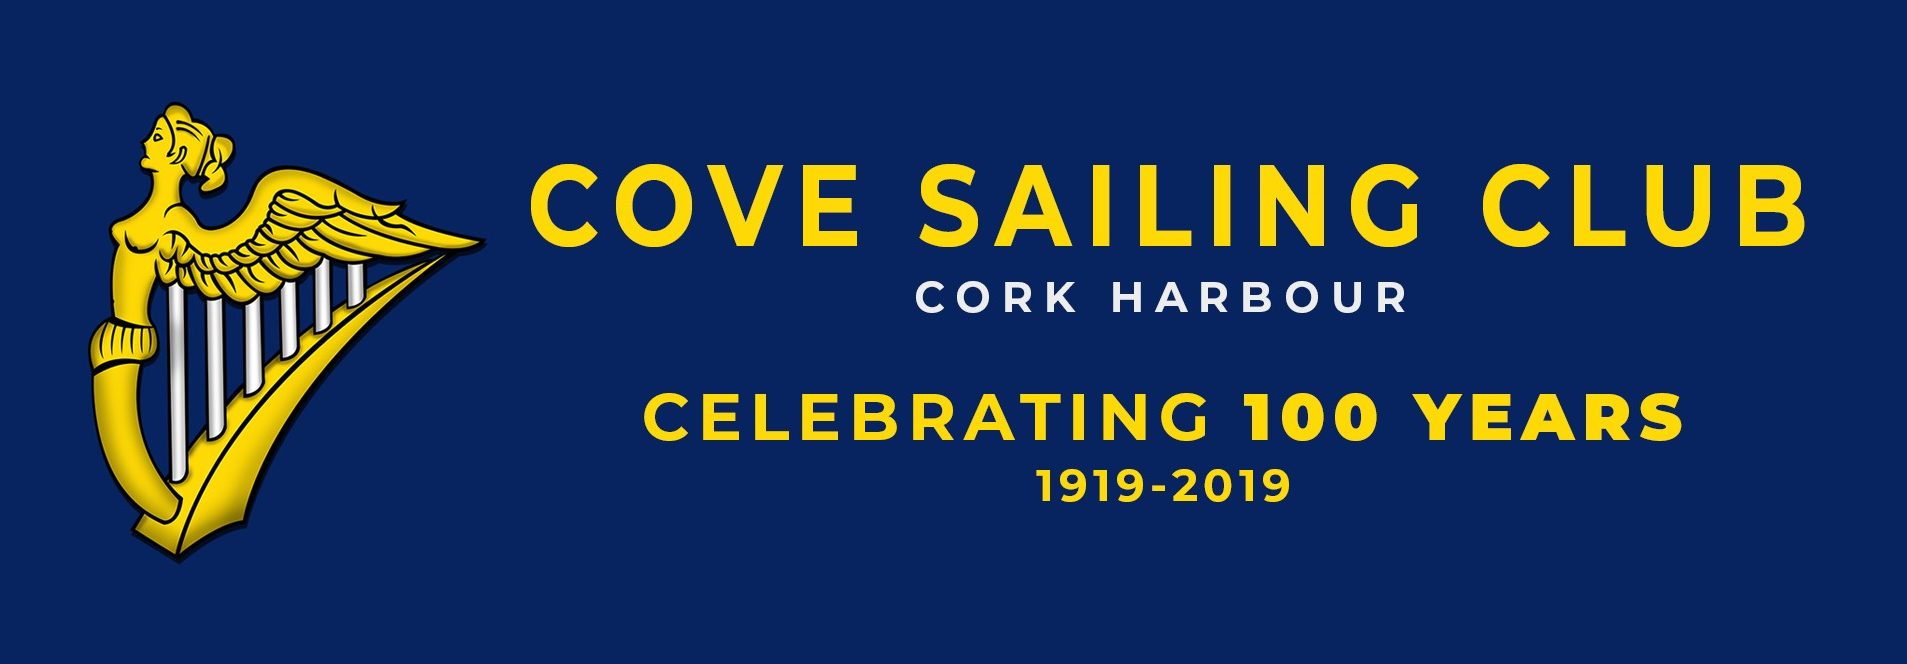 Cove Sailing Club